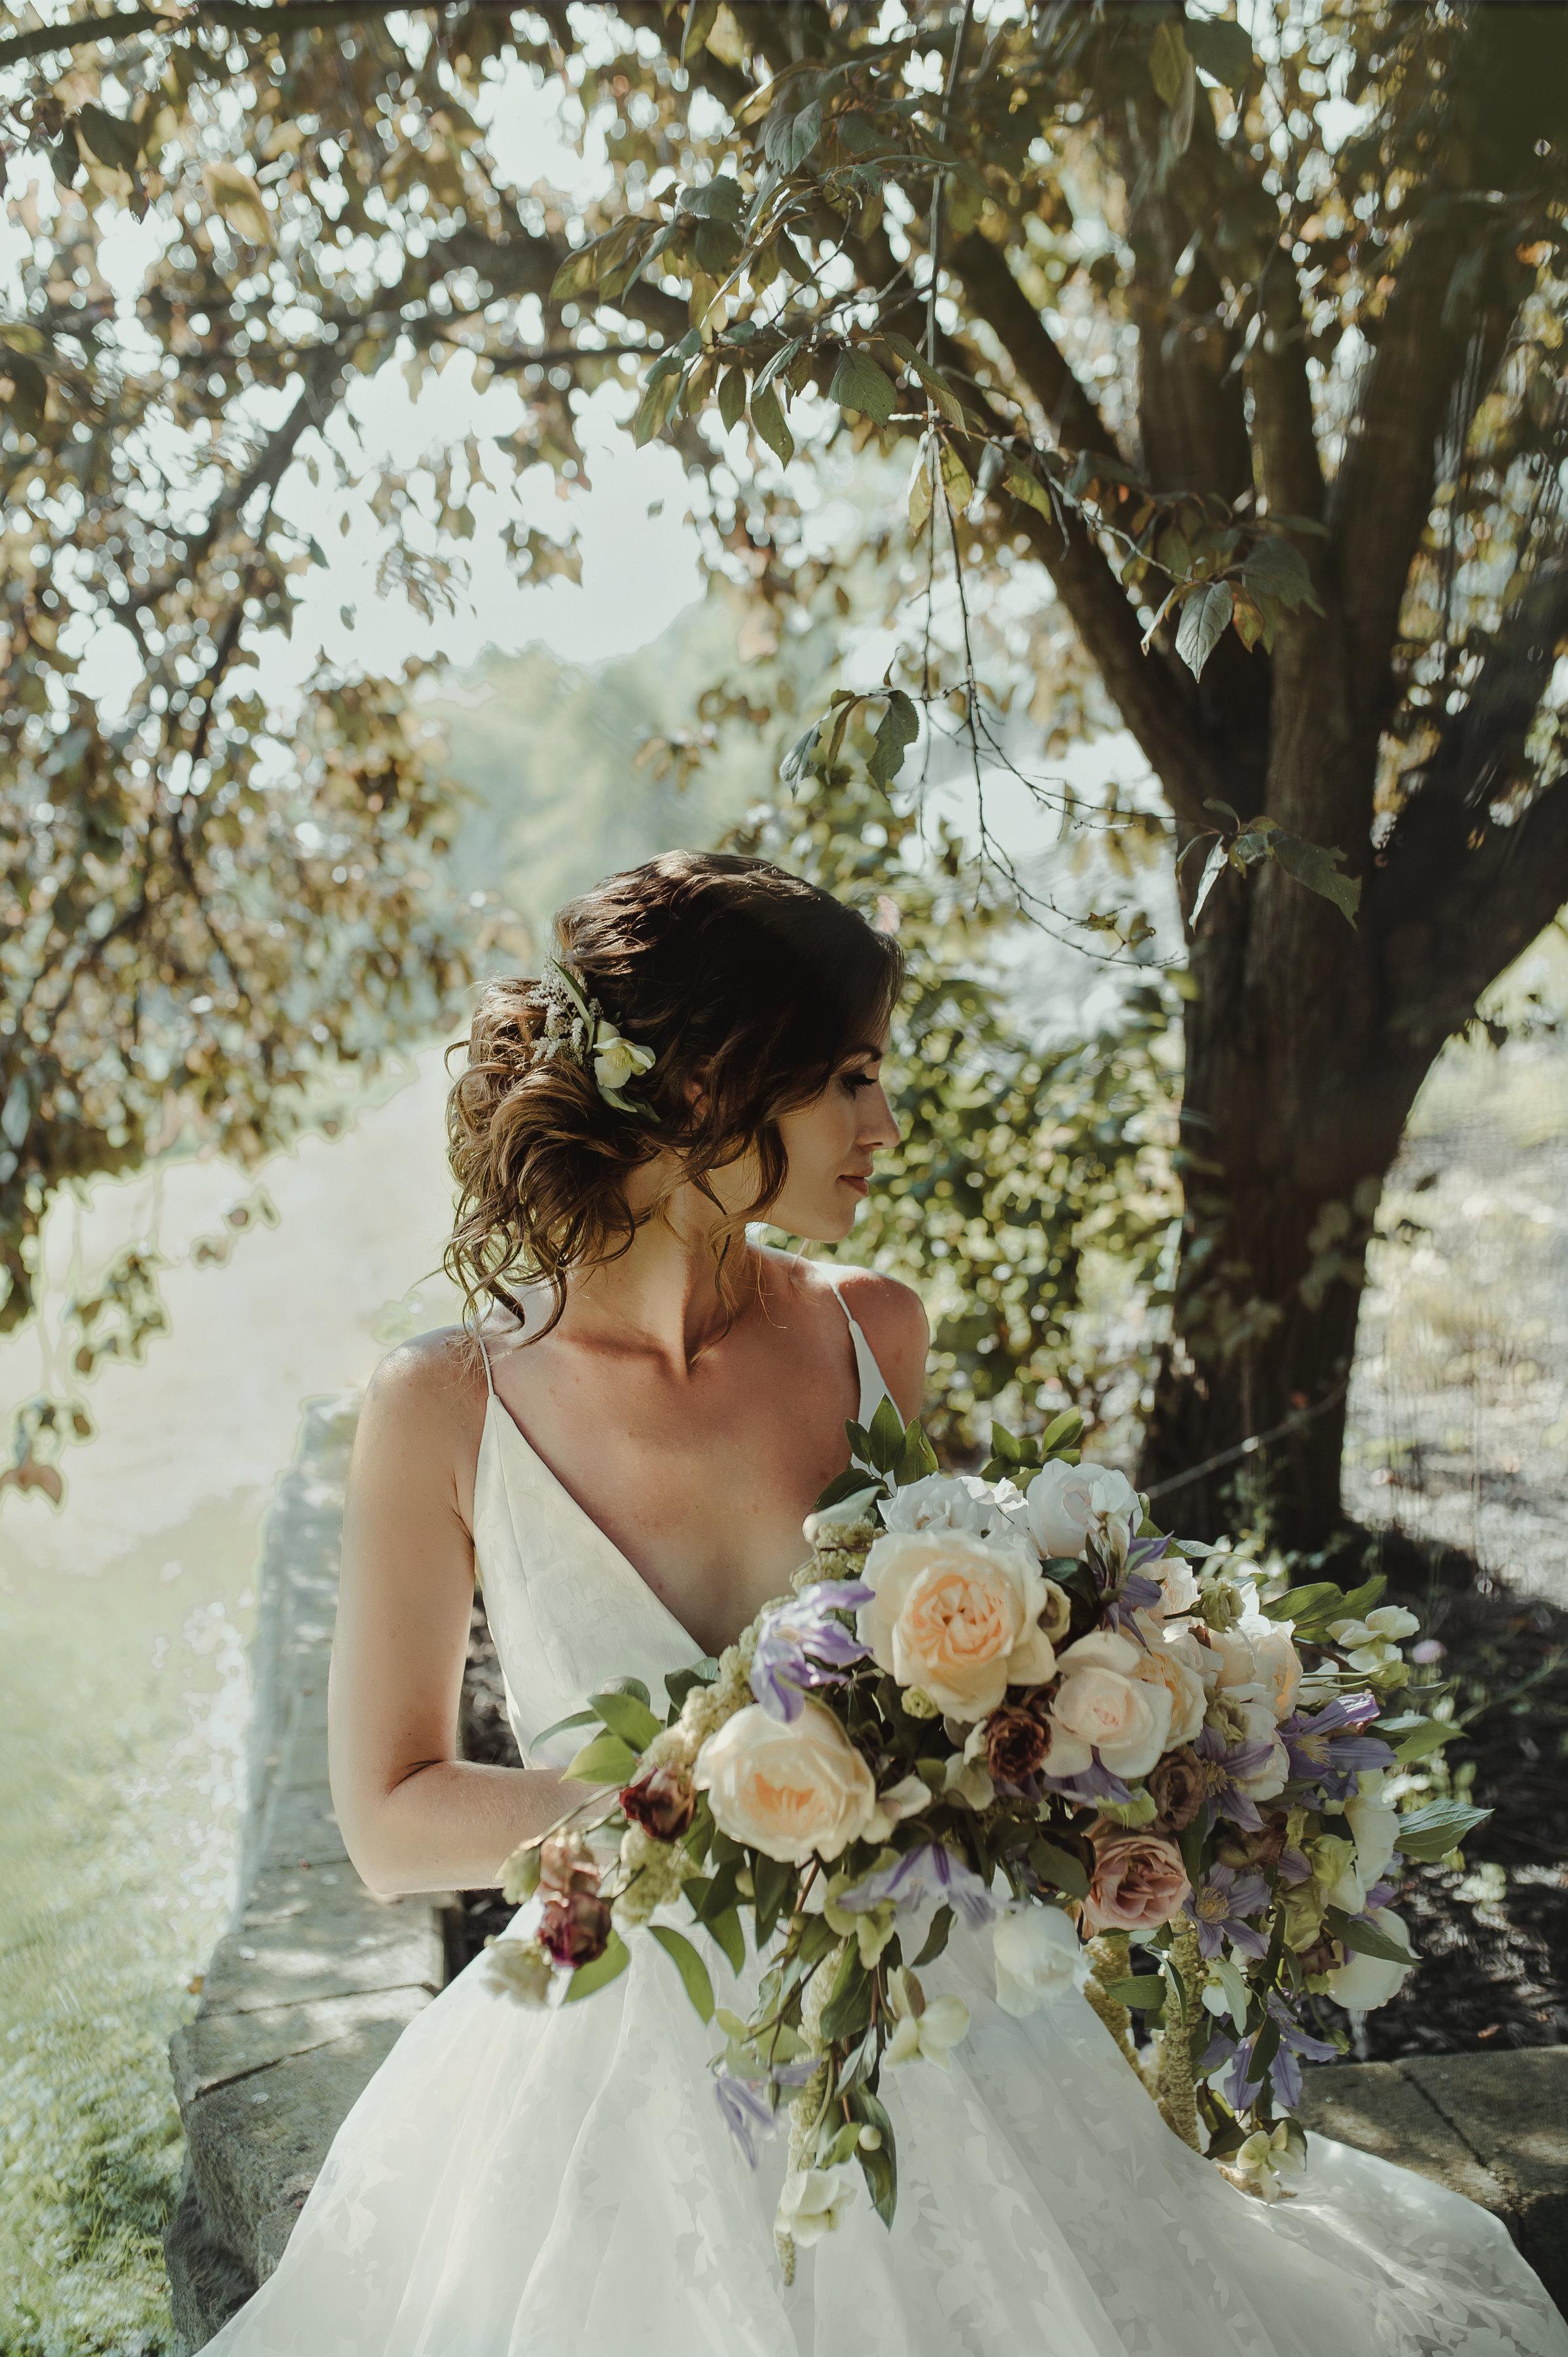 Rowanberry & Lavender